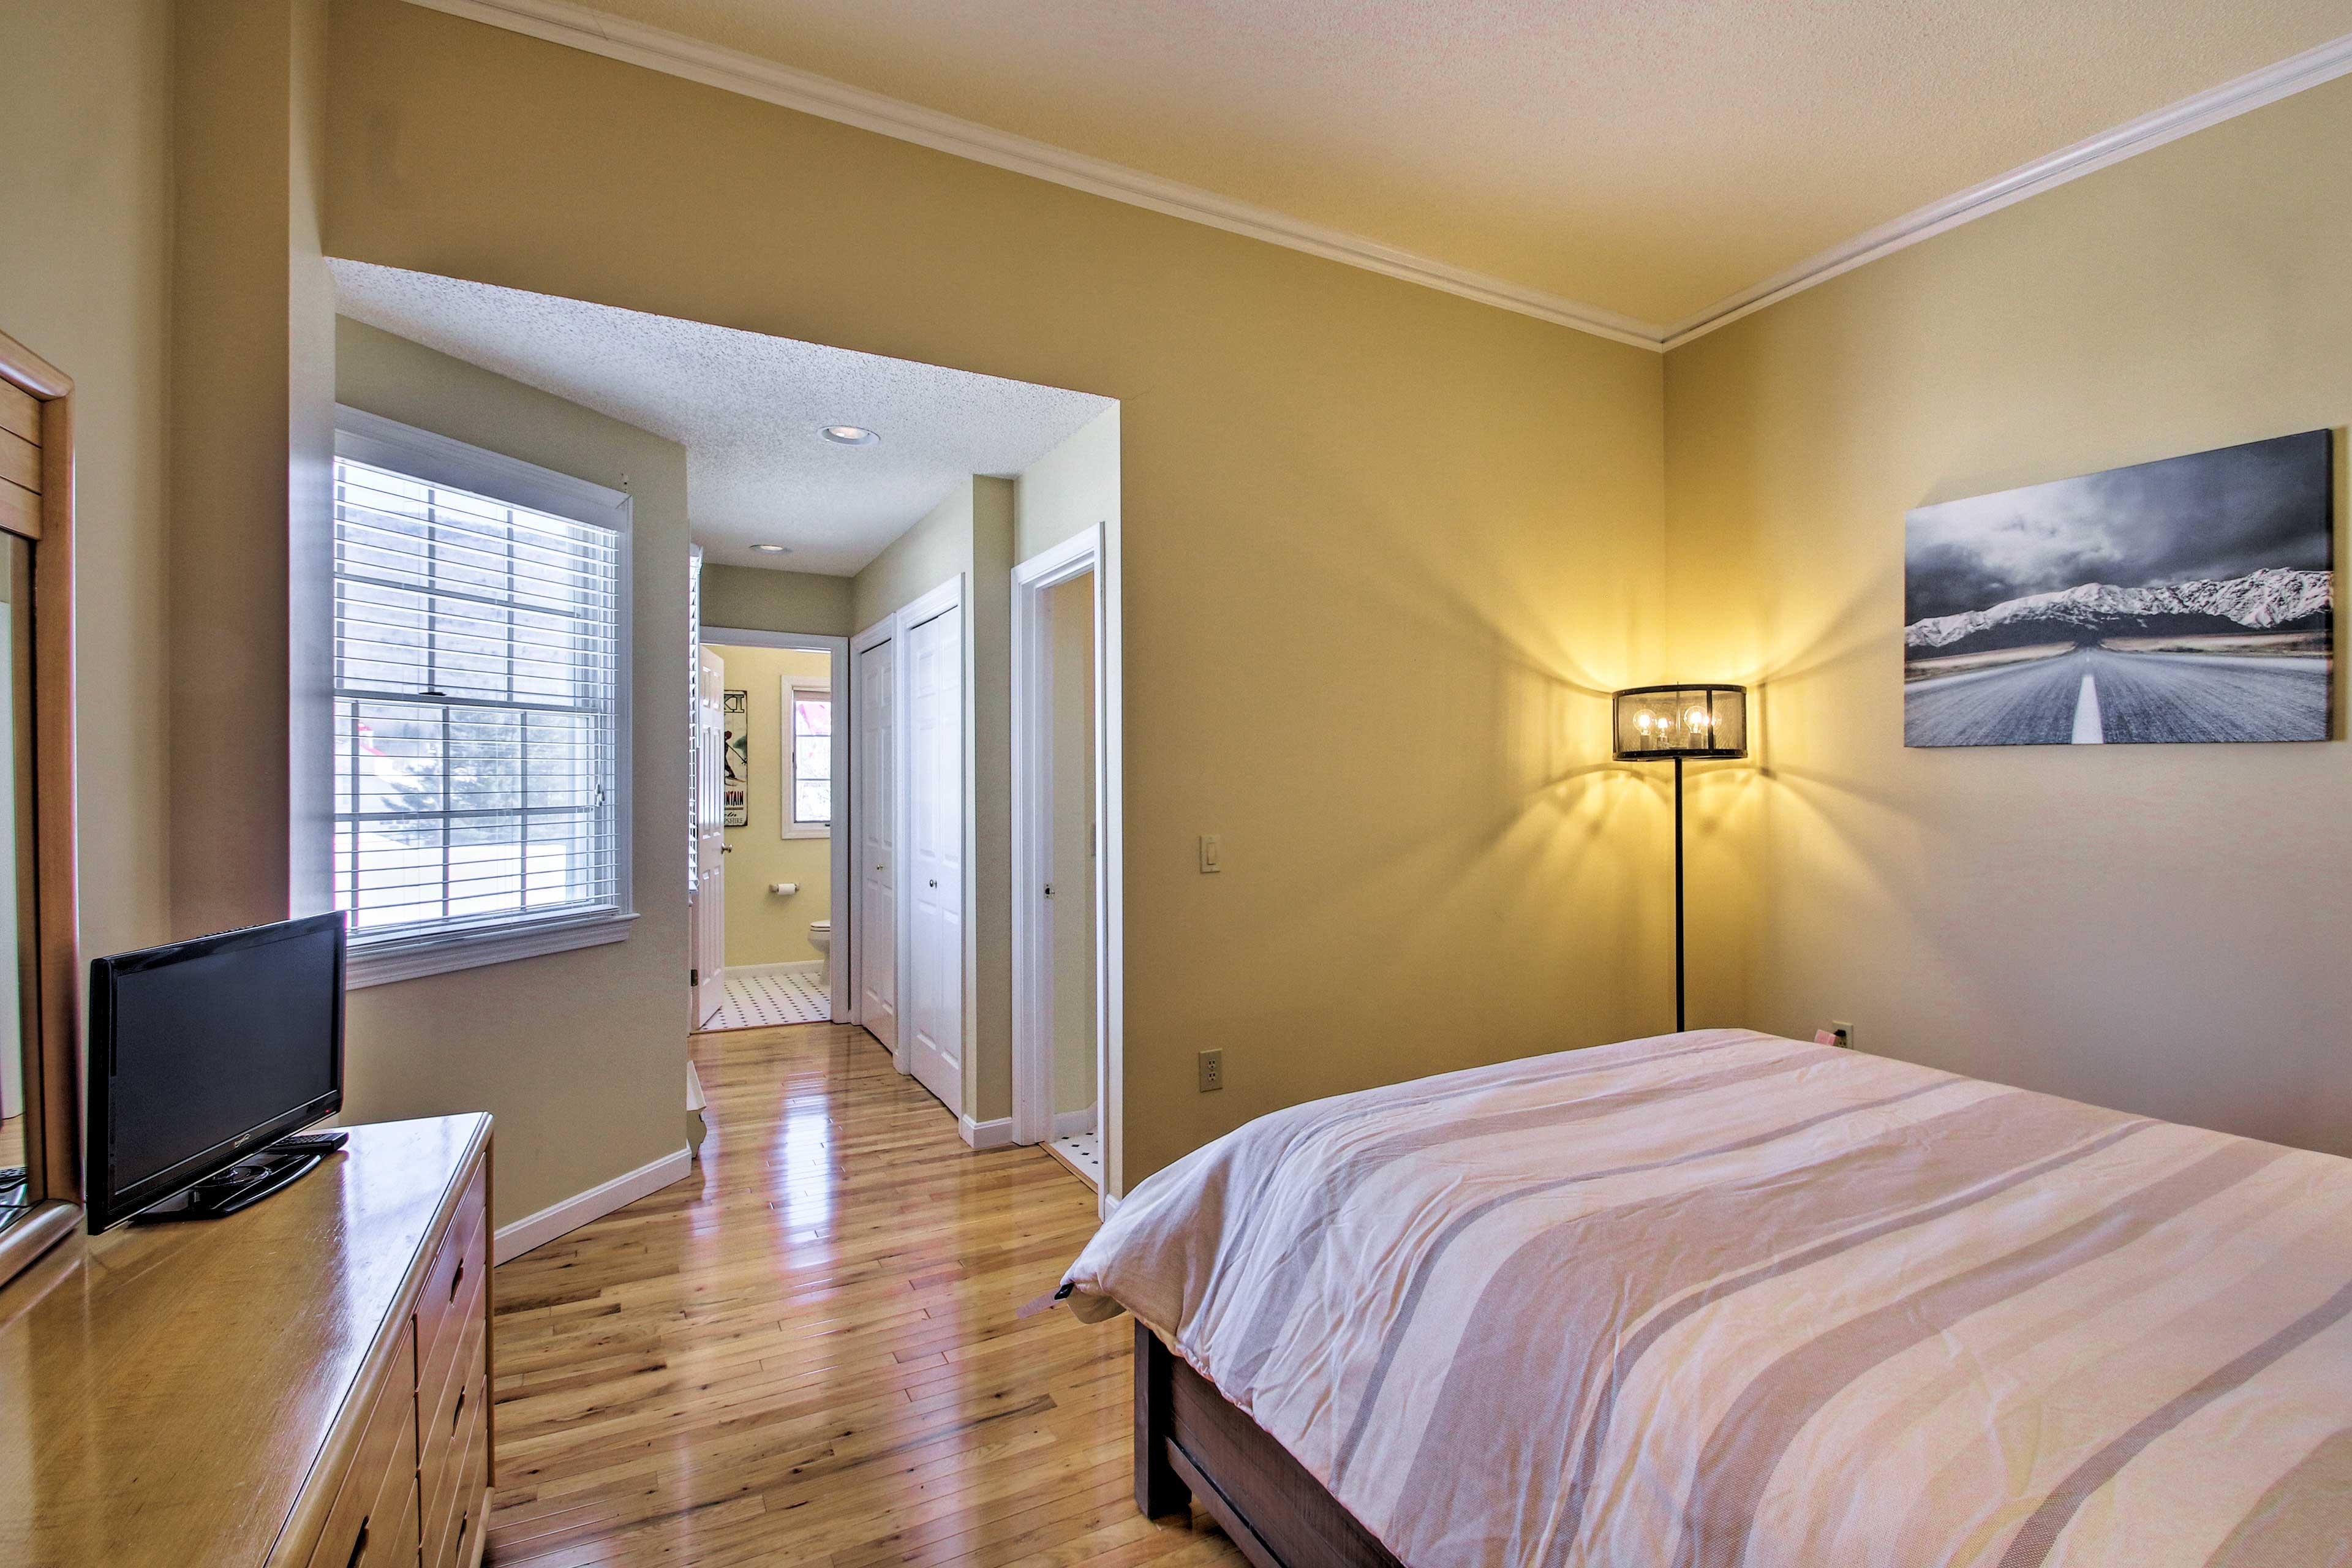 The master bedroom has an en-suite bathroom.